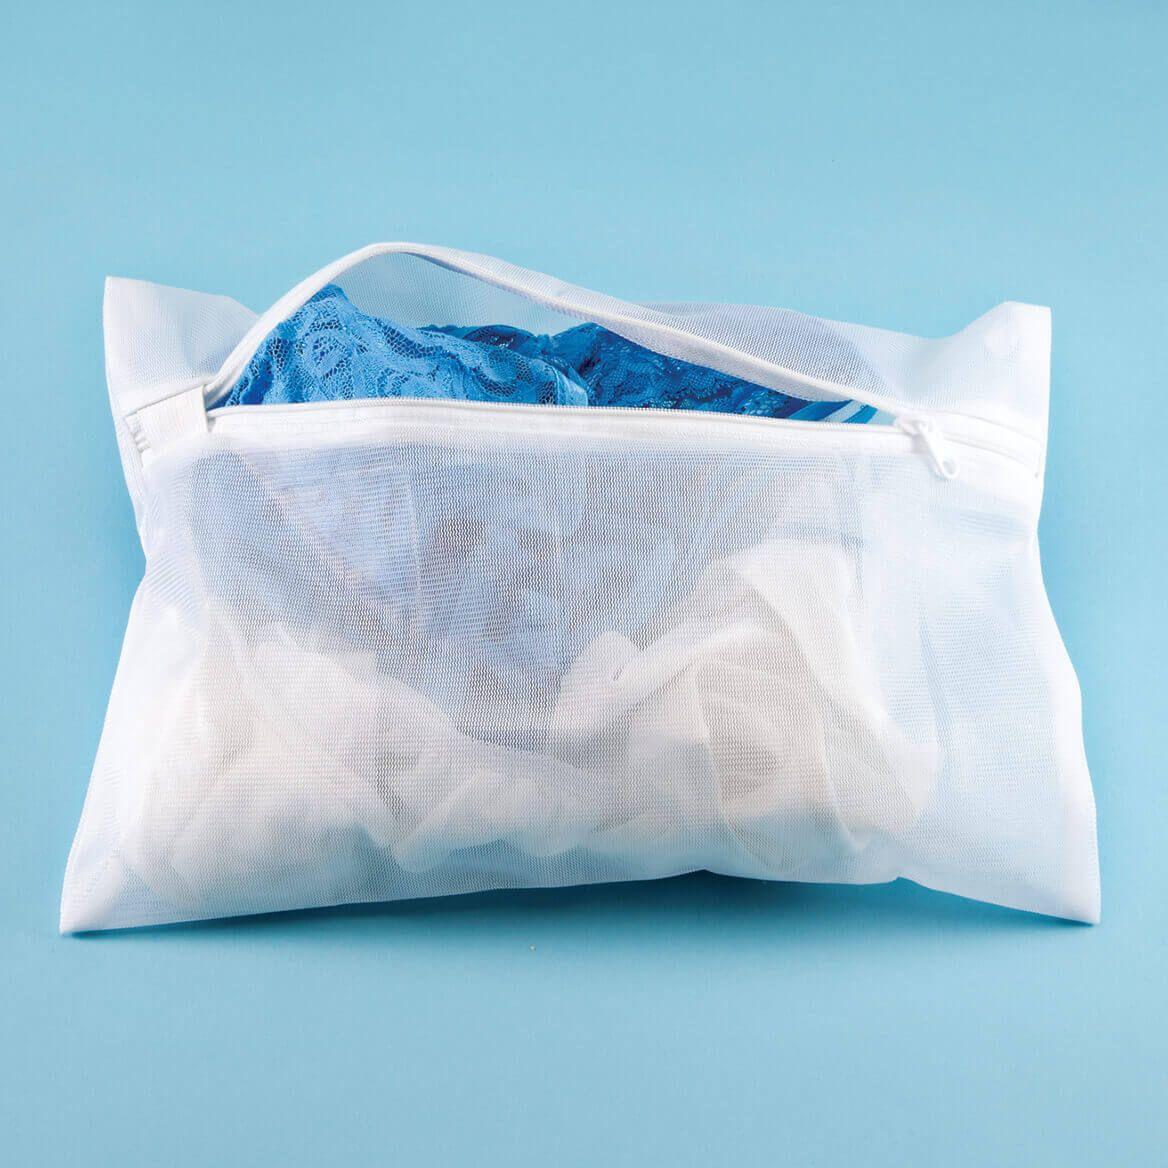 Mesh Laundry Bags - Set of 3-355169